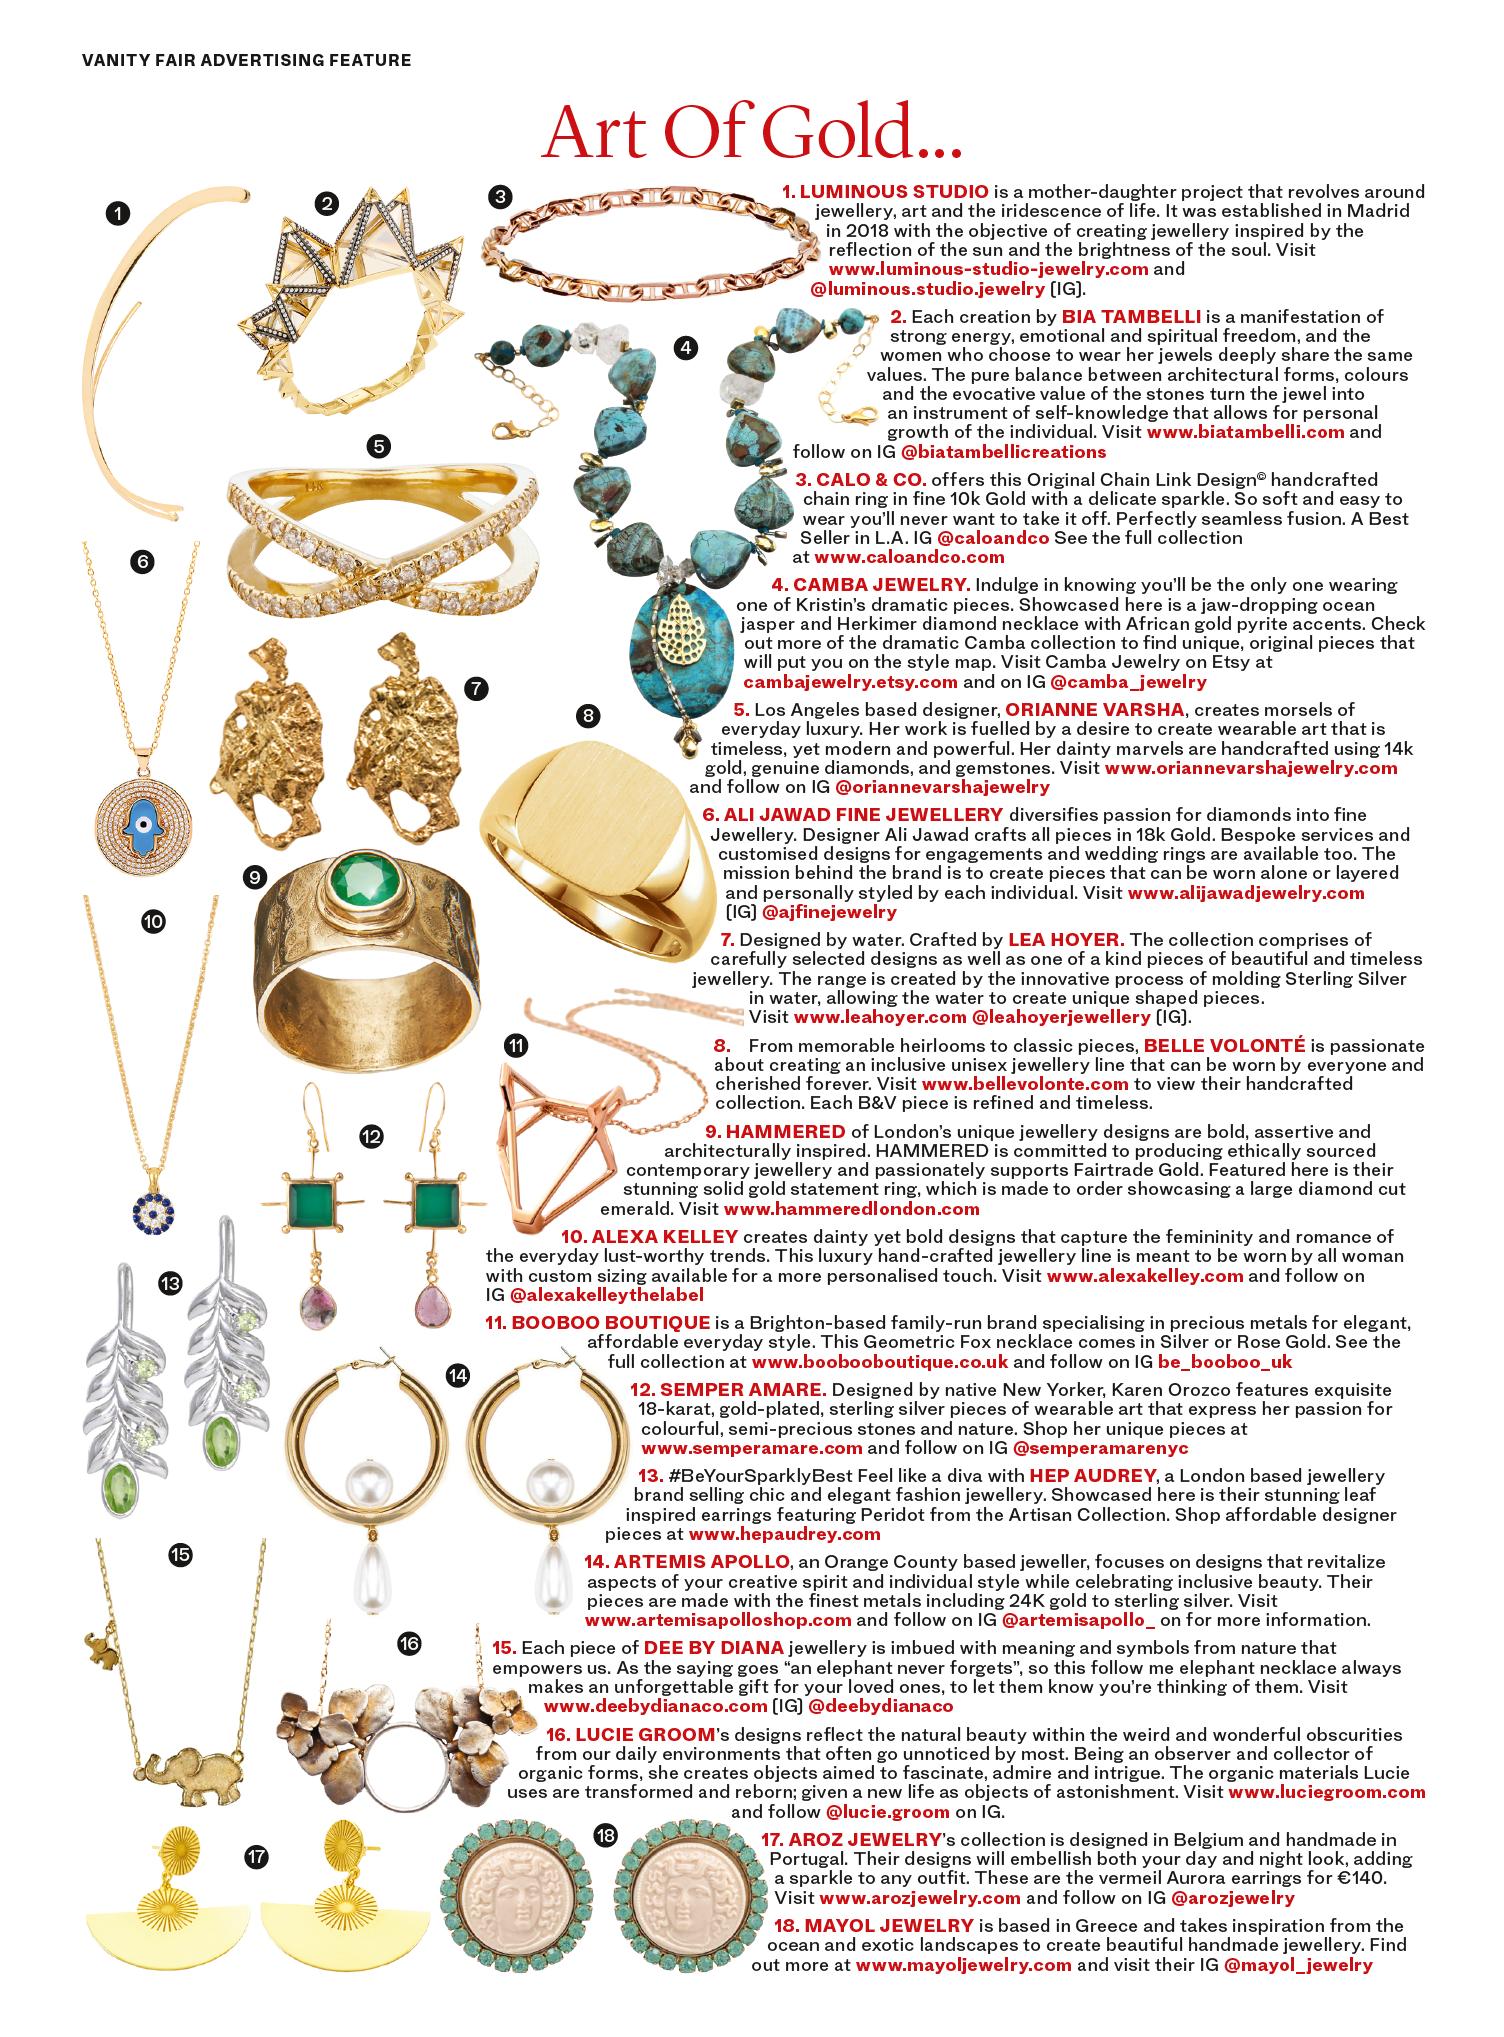 As seen in Vanity Fair // April 2019 // The Art of Gold